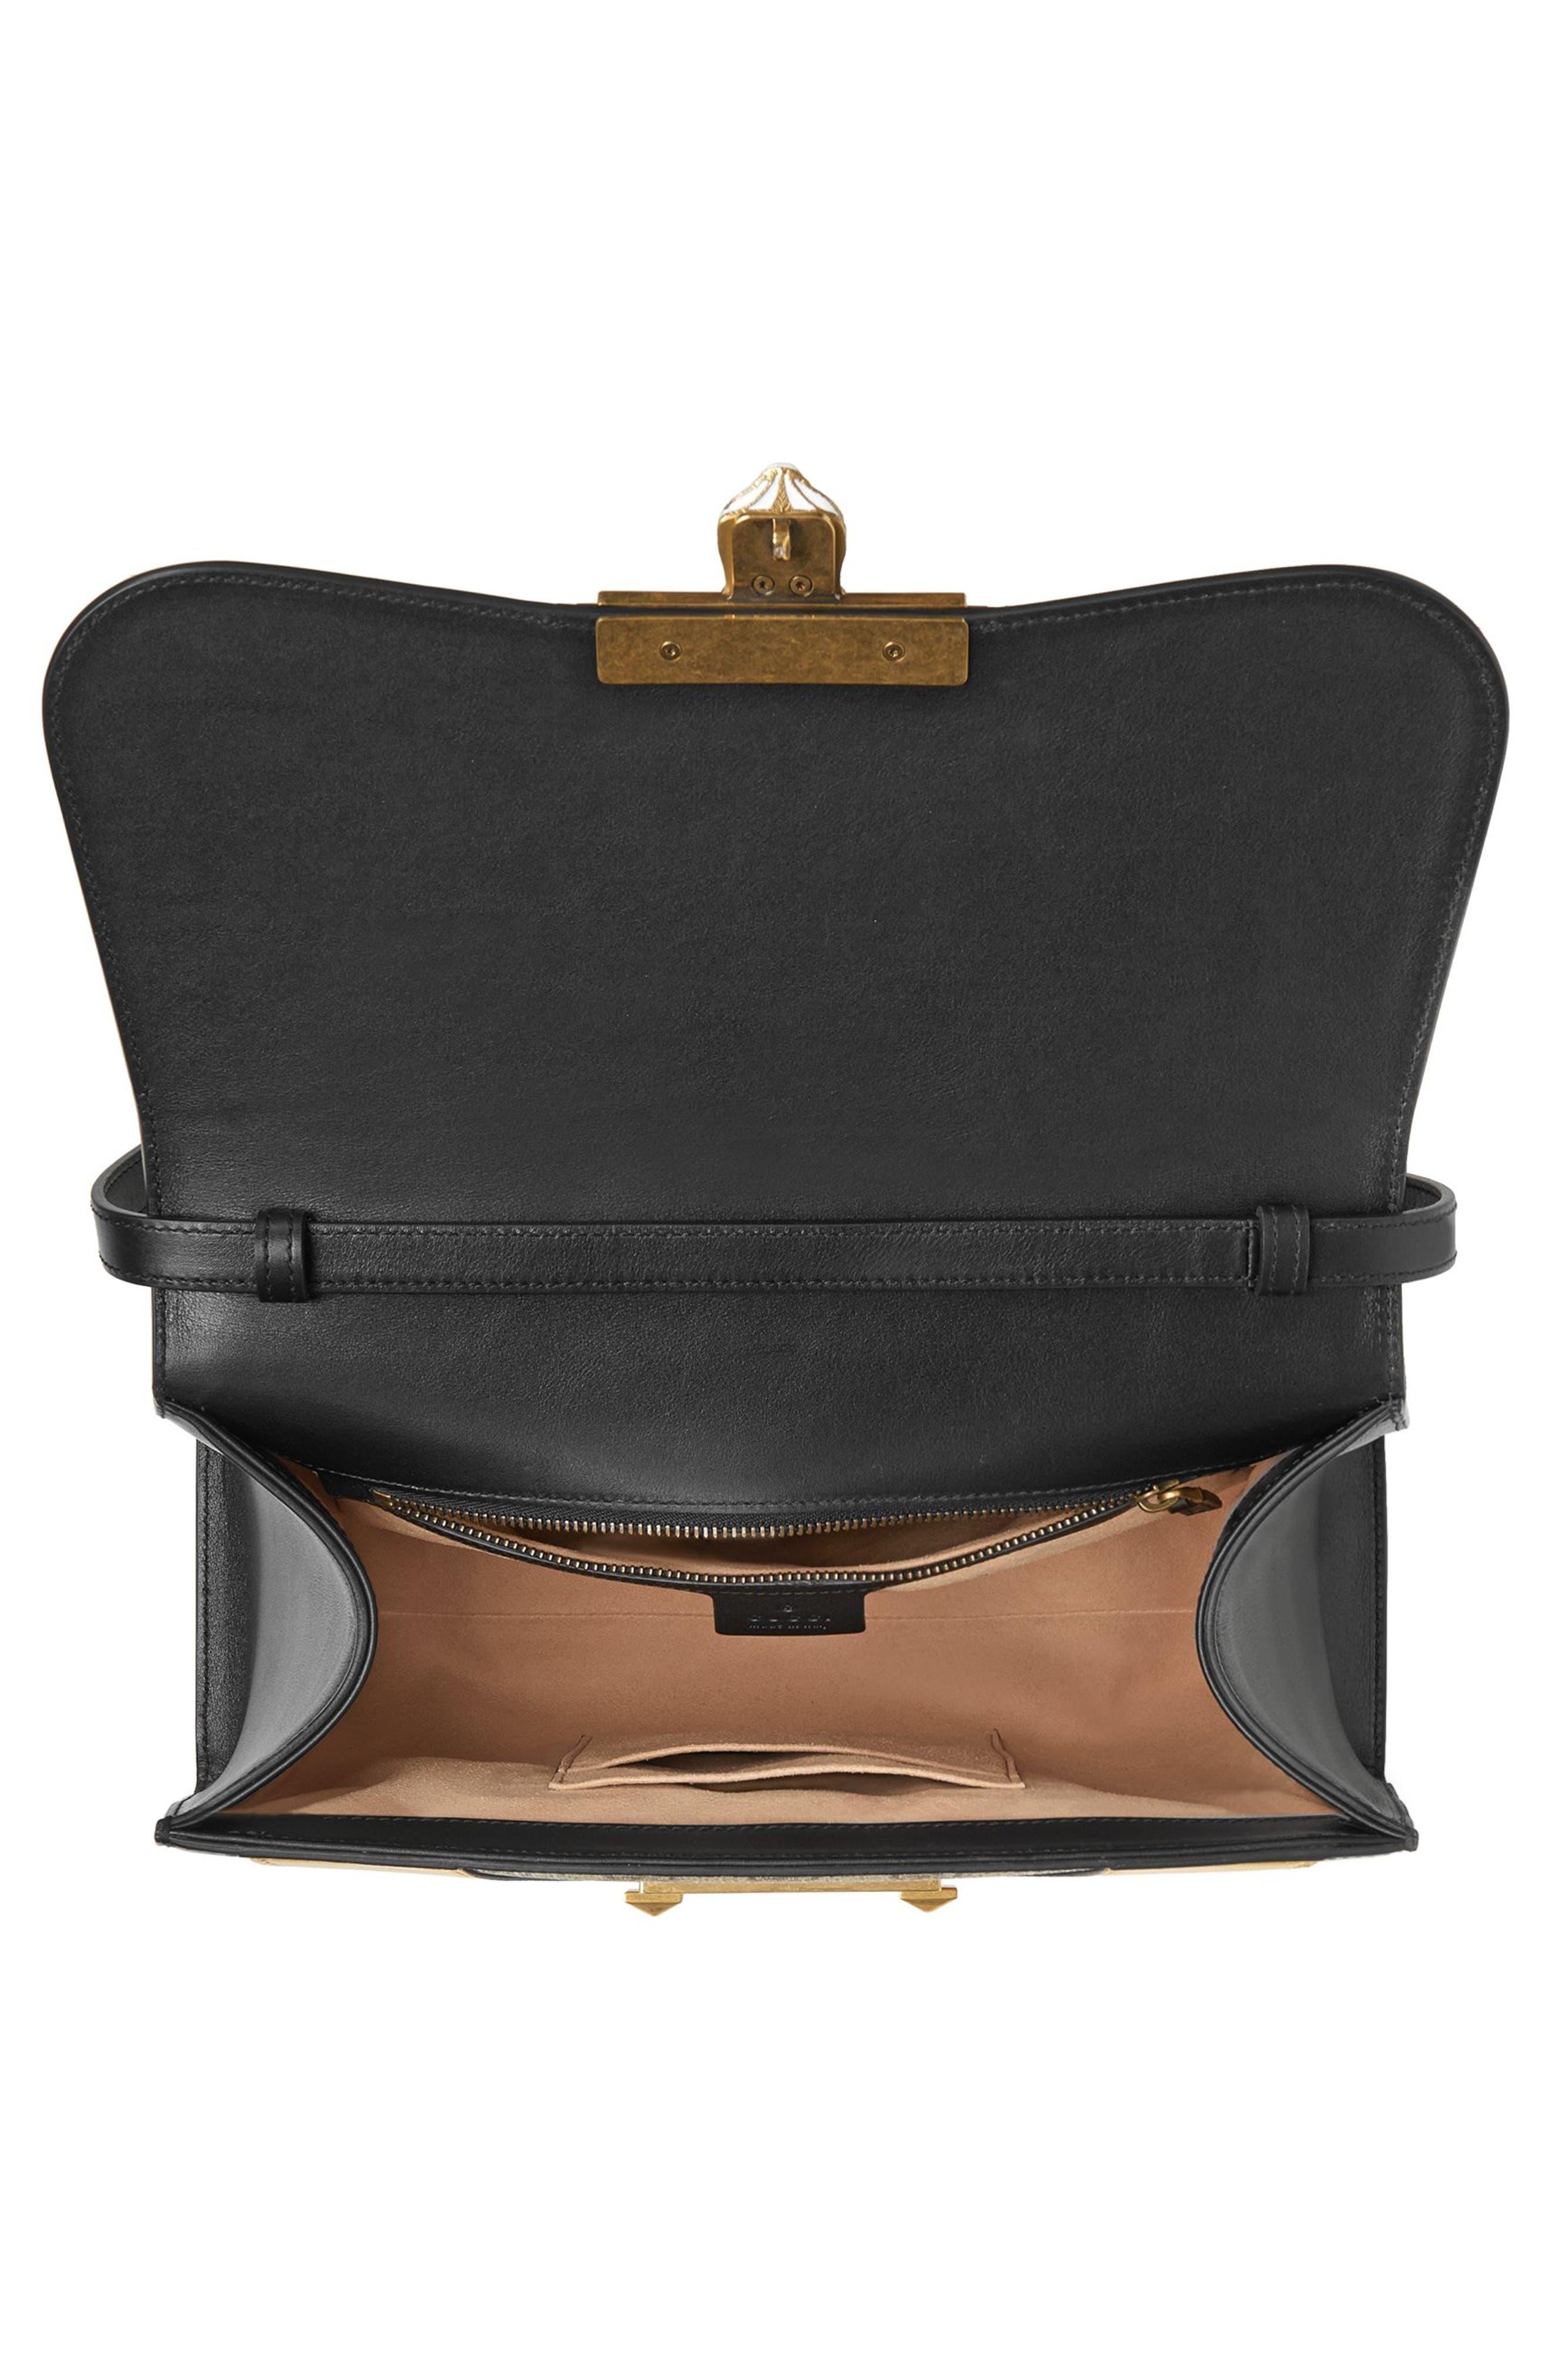 Alternate Image 3  - Gucci Osiride Top Handle GG Supreme & Leather Satchel